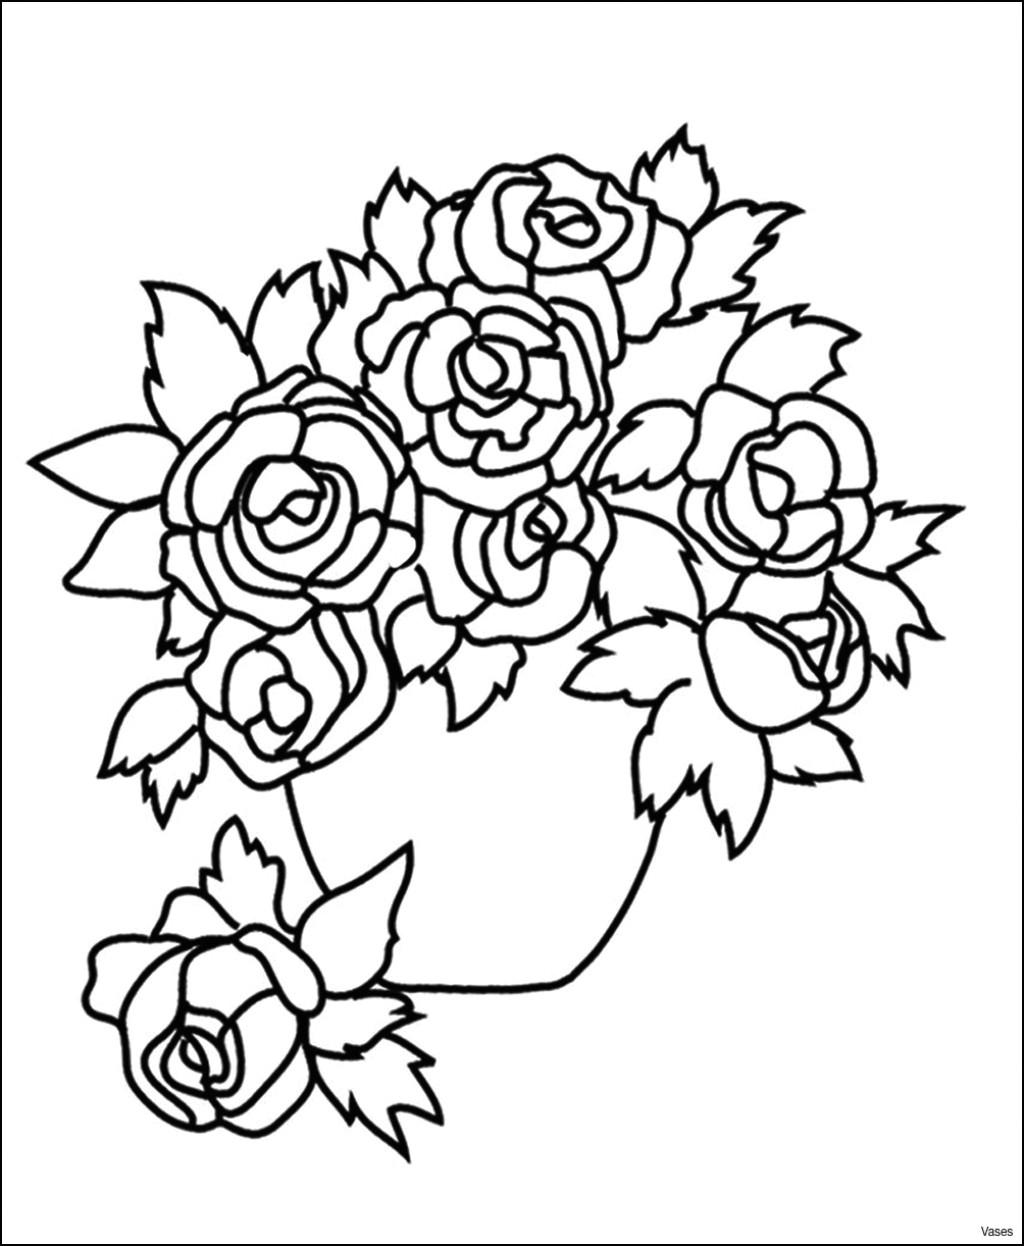 Drawing Picture Of Flower Vase Flower Garden Near Me Fresh Best Vases Flower Vase Coloring Page